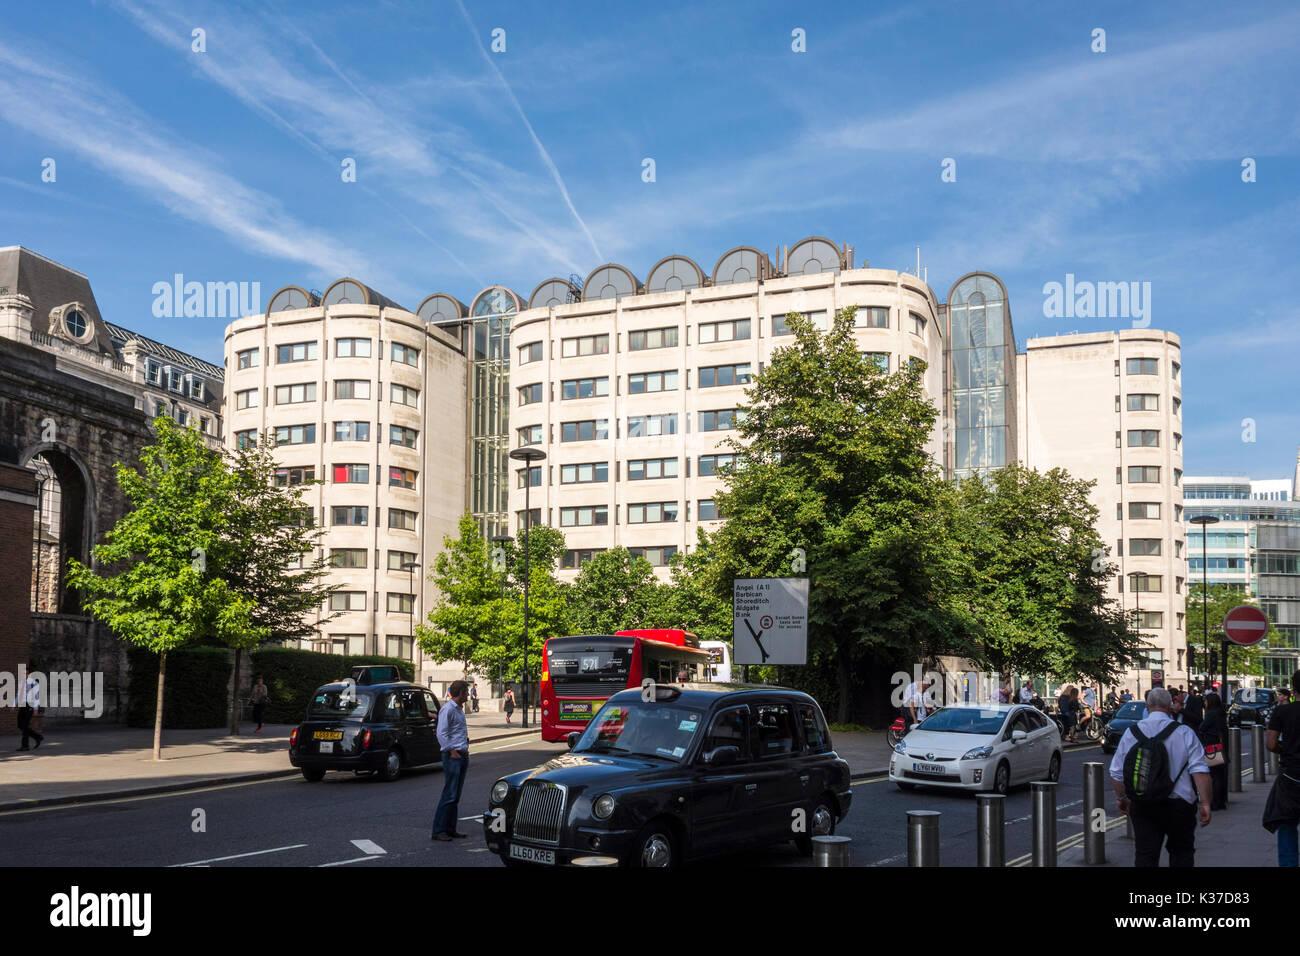 BT Centre, global headquarters of BT Group (British Telecom). 81 Newgate Street, City of London, UK - Stock Image